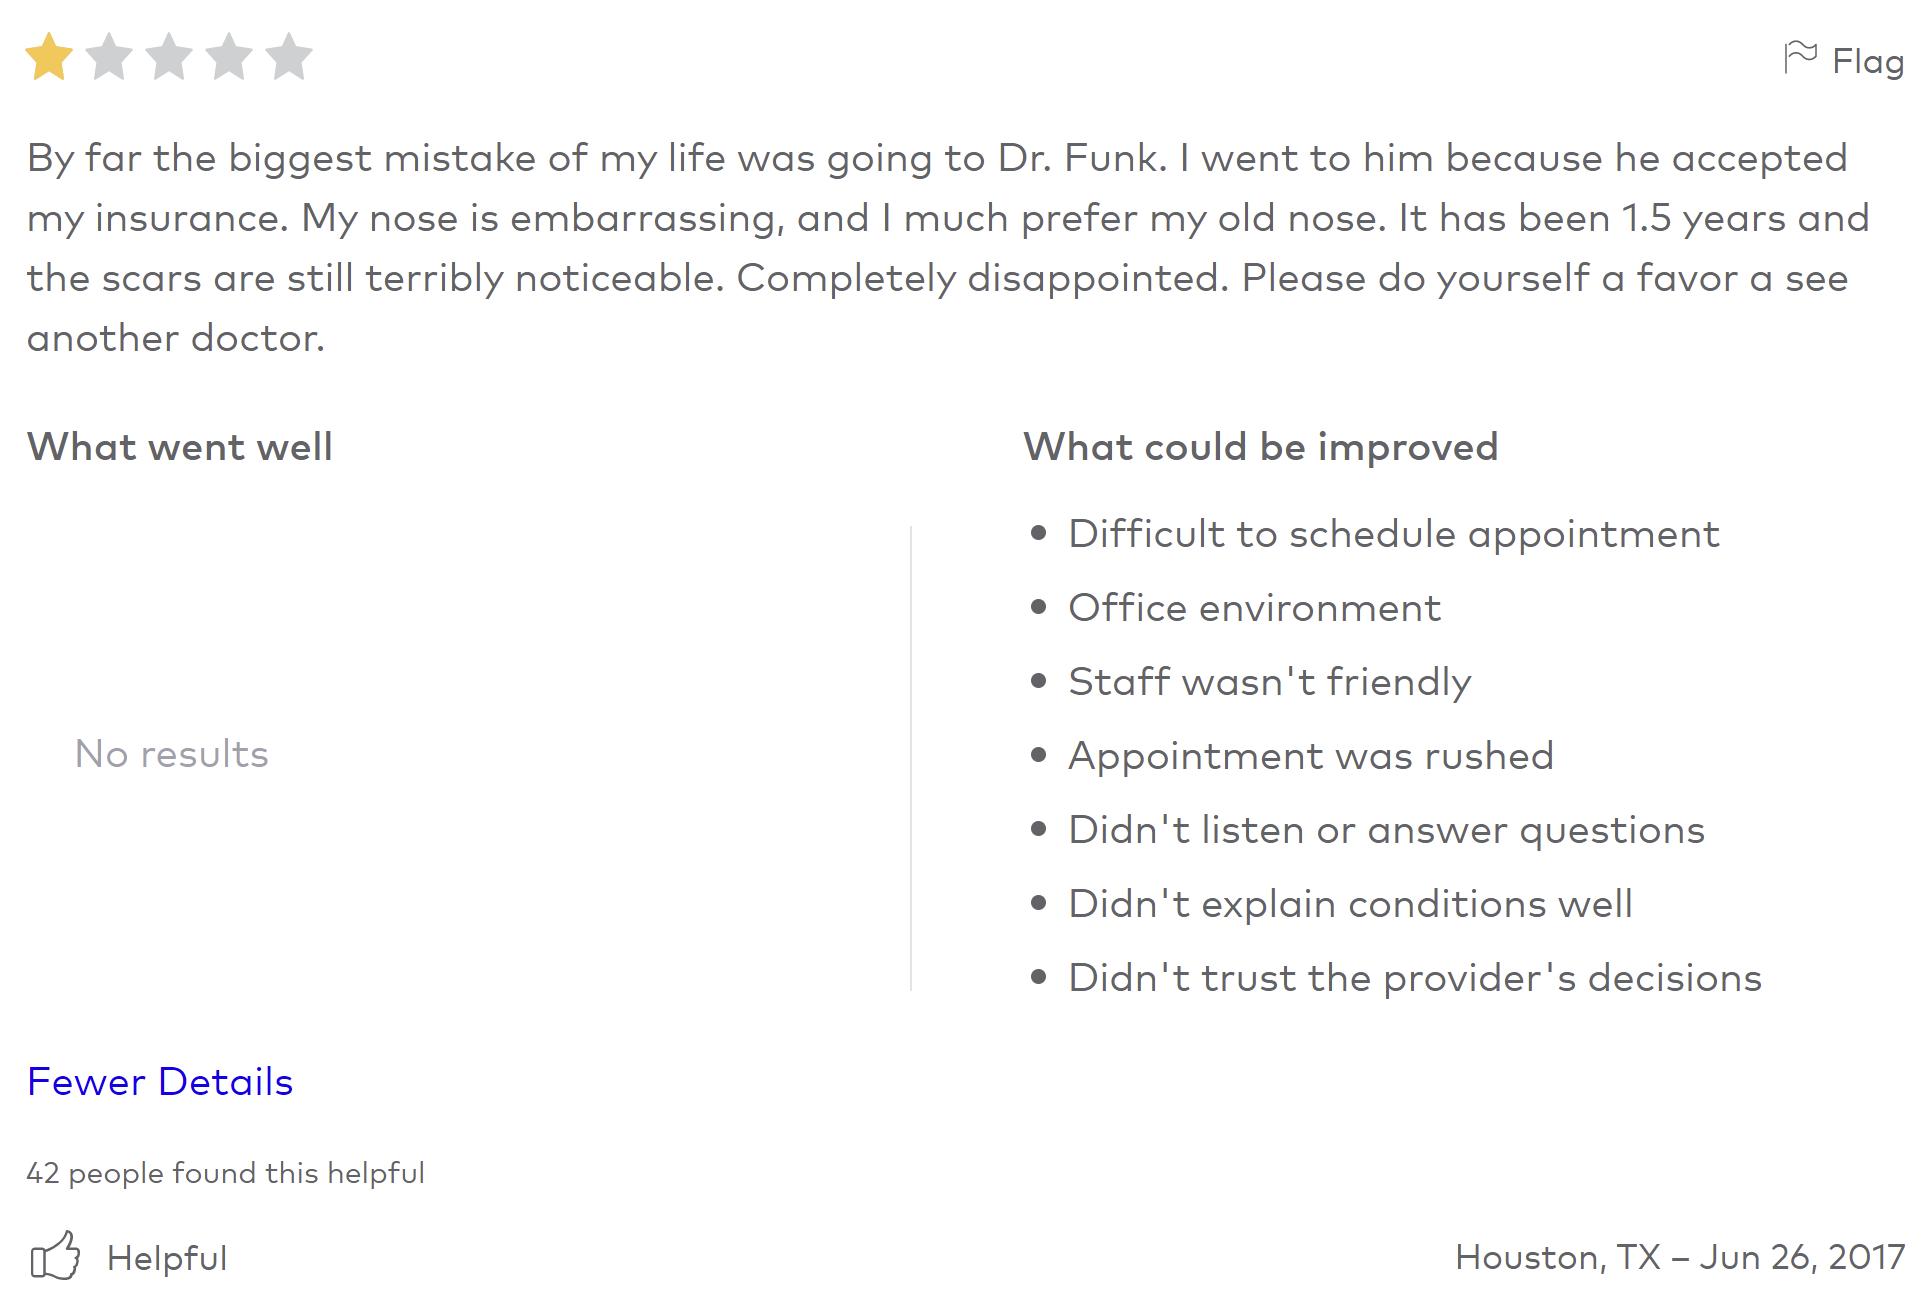 Funk Facial Plastic Surgery review